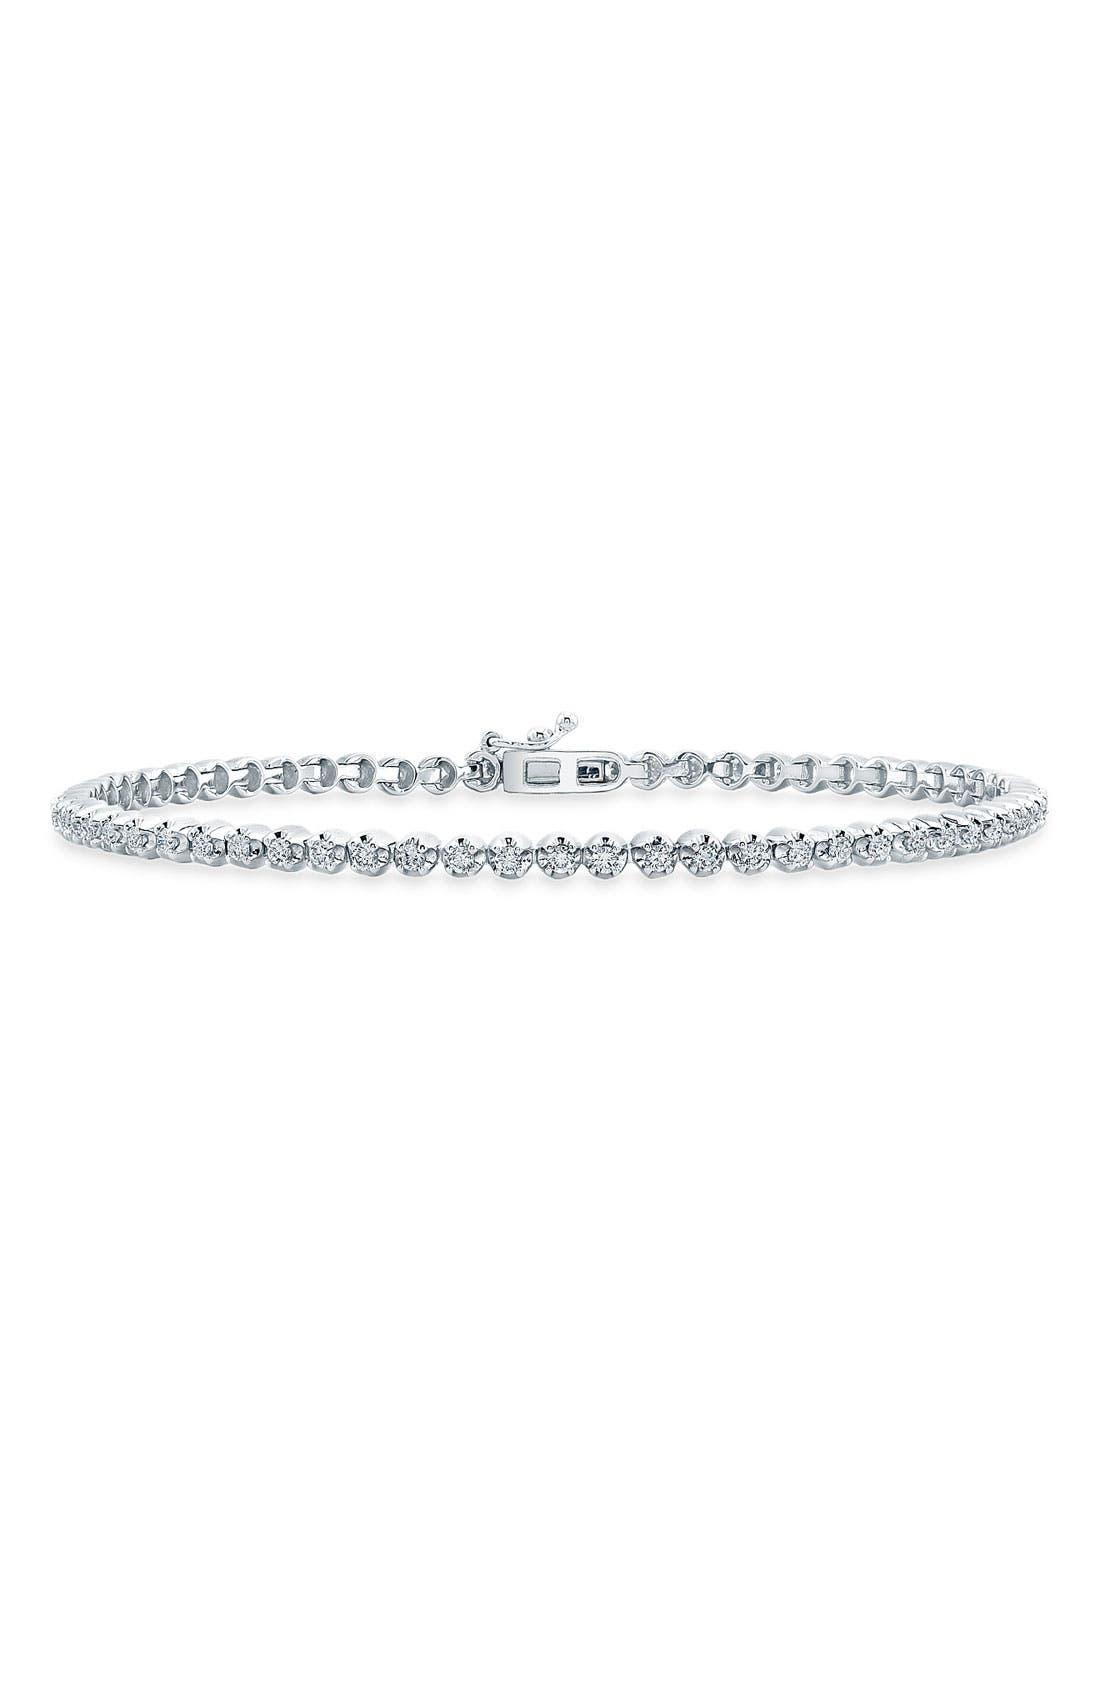 Alternate Image 1 Selected - Bony Levy Diamond Line Bracelet (Nordstrom Exclusive) (Limited Edition)